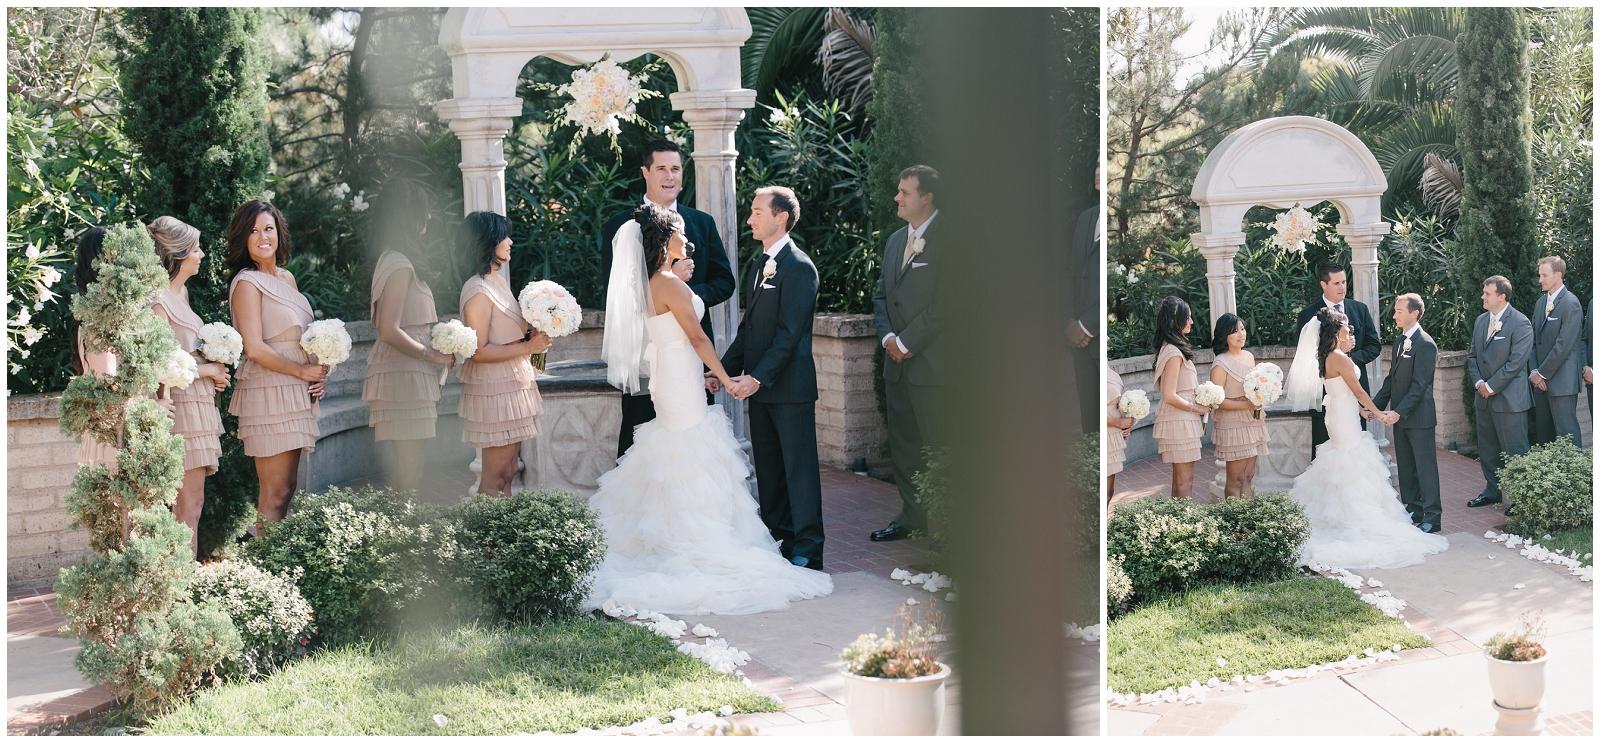 San-Francisco-Bay-Area-Wedding-Photography-Destination-15.jpg